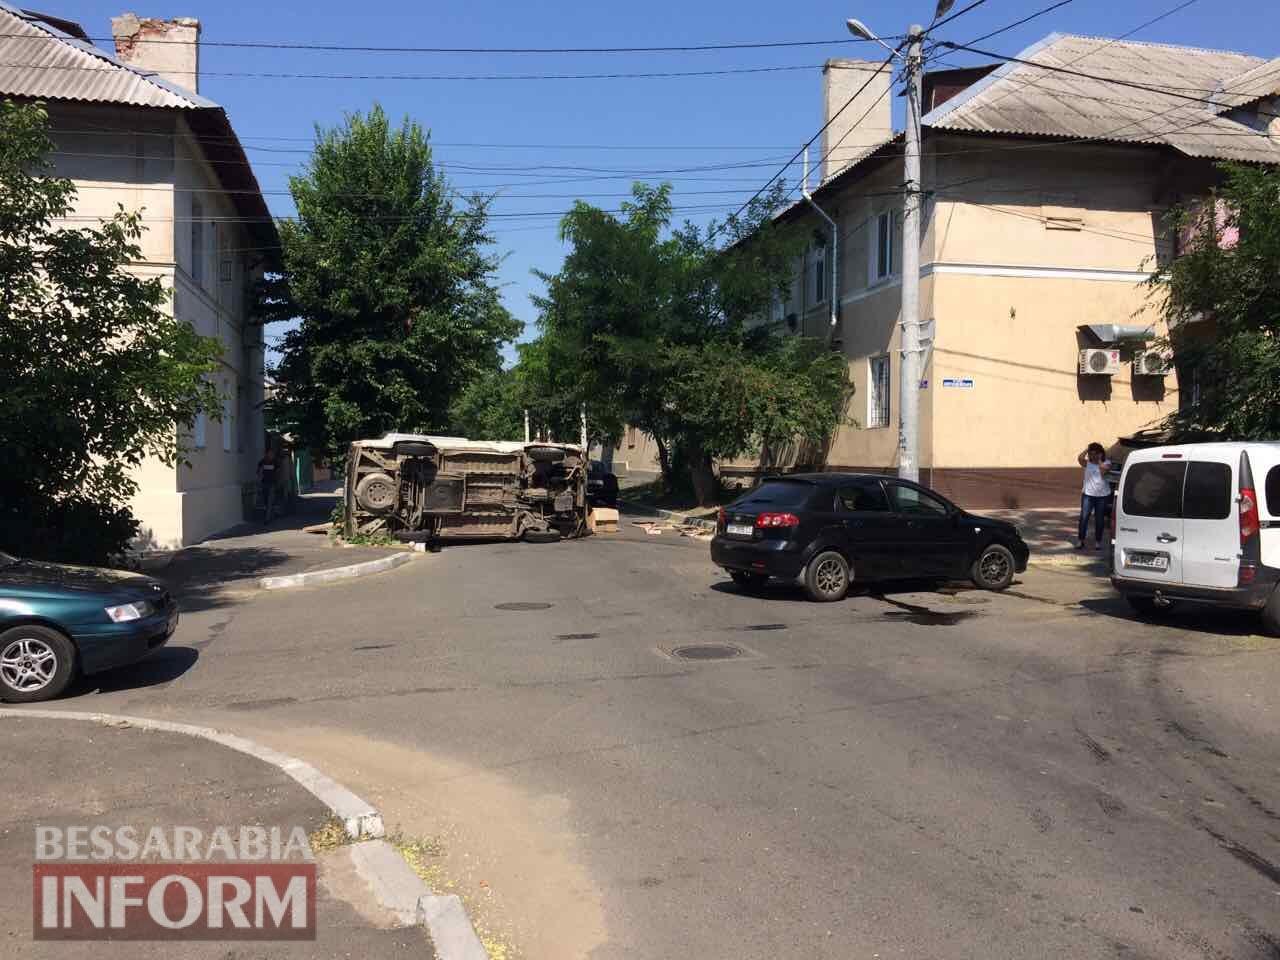 596f1fed60417_2334656456 ДТП в Измаиле: Chevrolet Lacetti завалил на бок грузовой микроавтобус